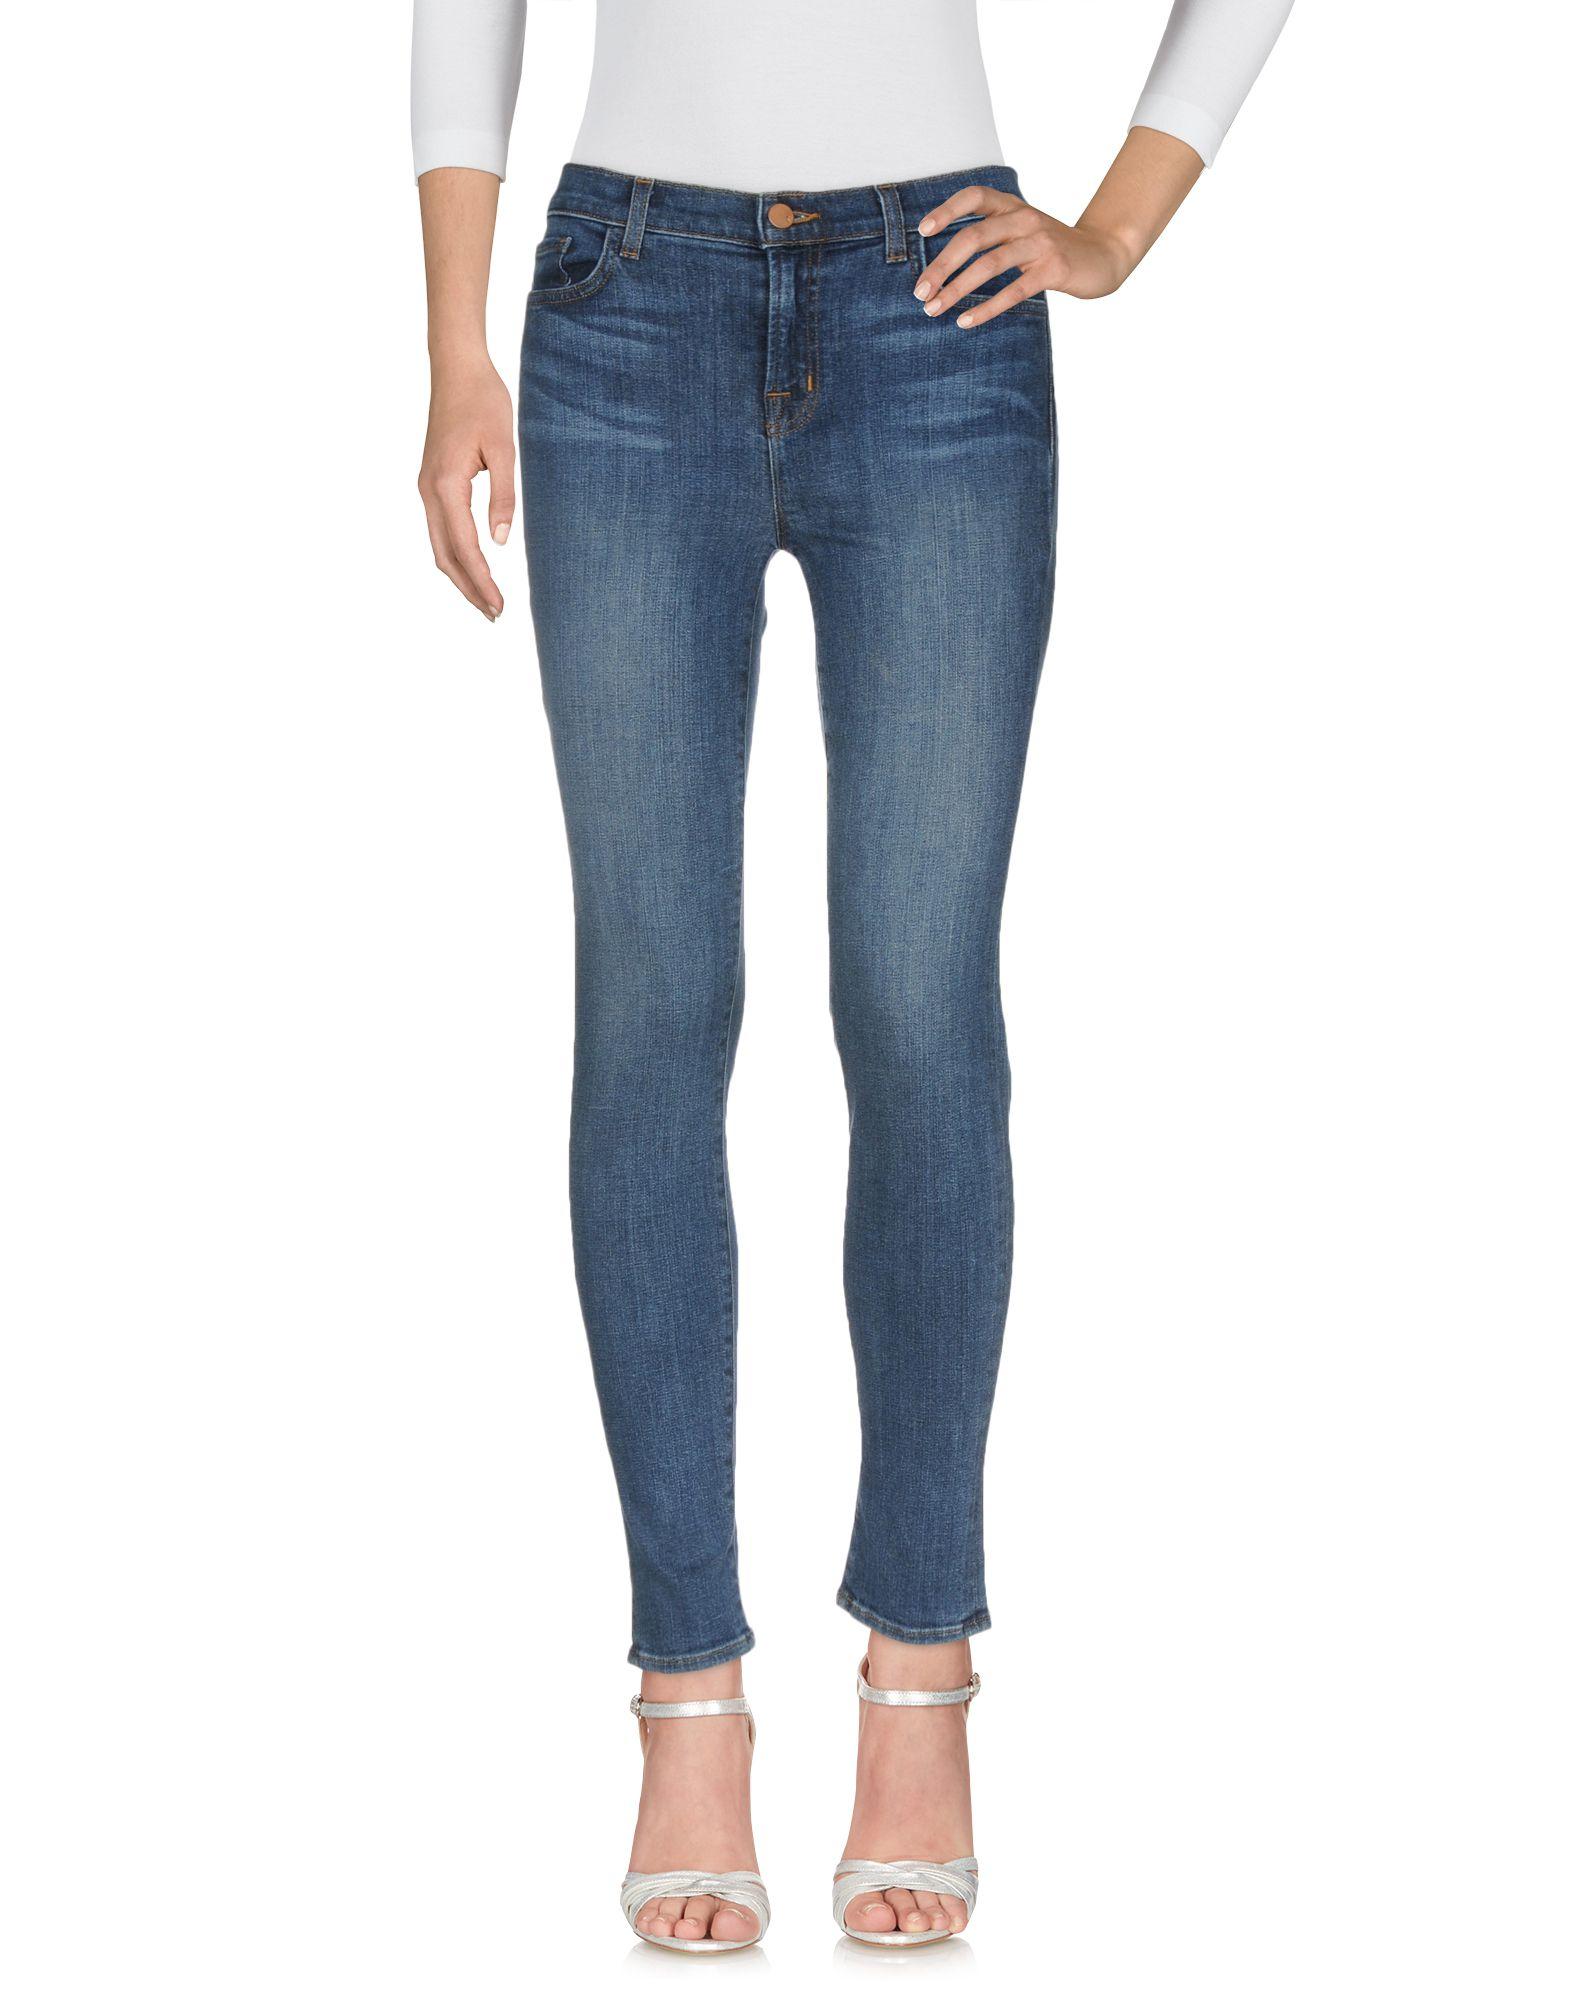 Pantaloni Jeans J Brand Donna - Acquista online su HIQeo0